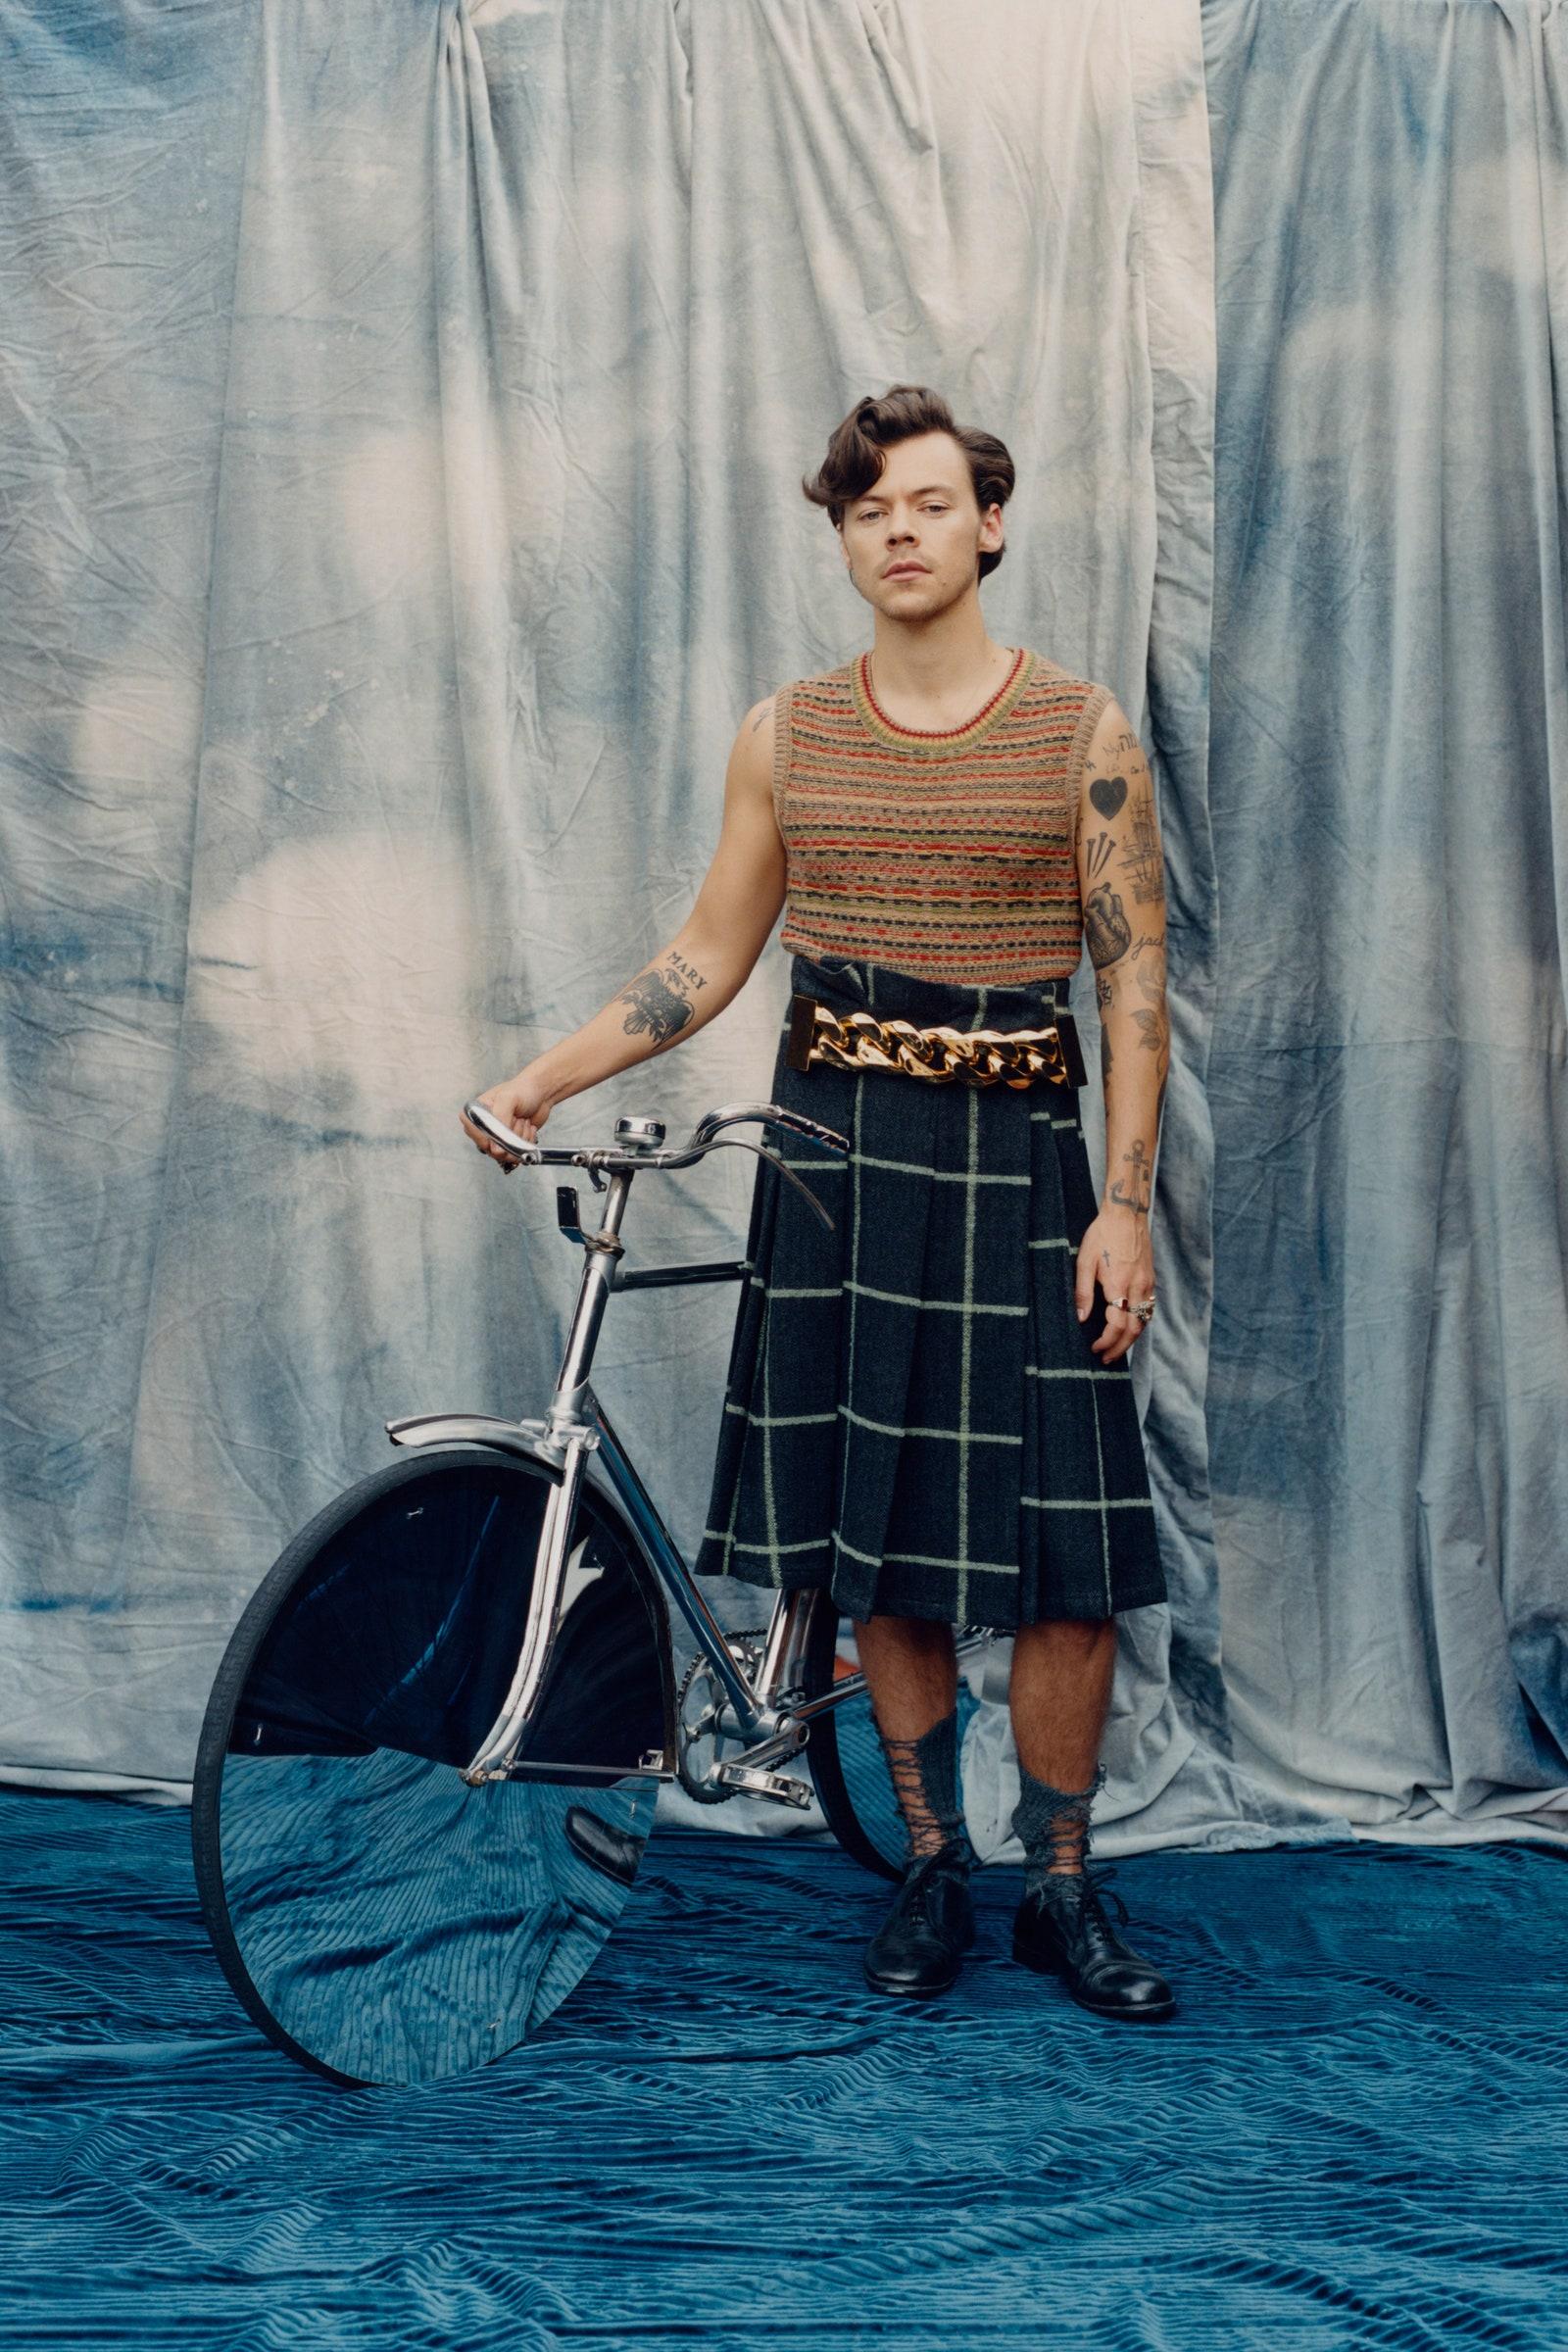 Harry Styles x Vogue America